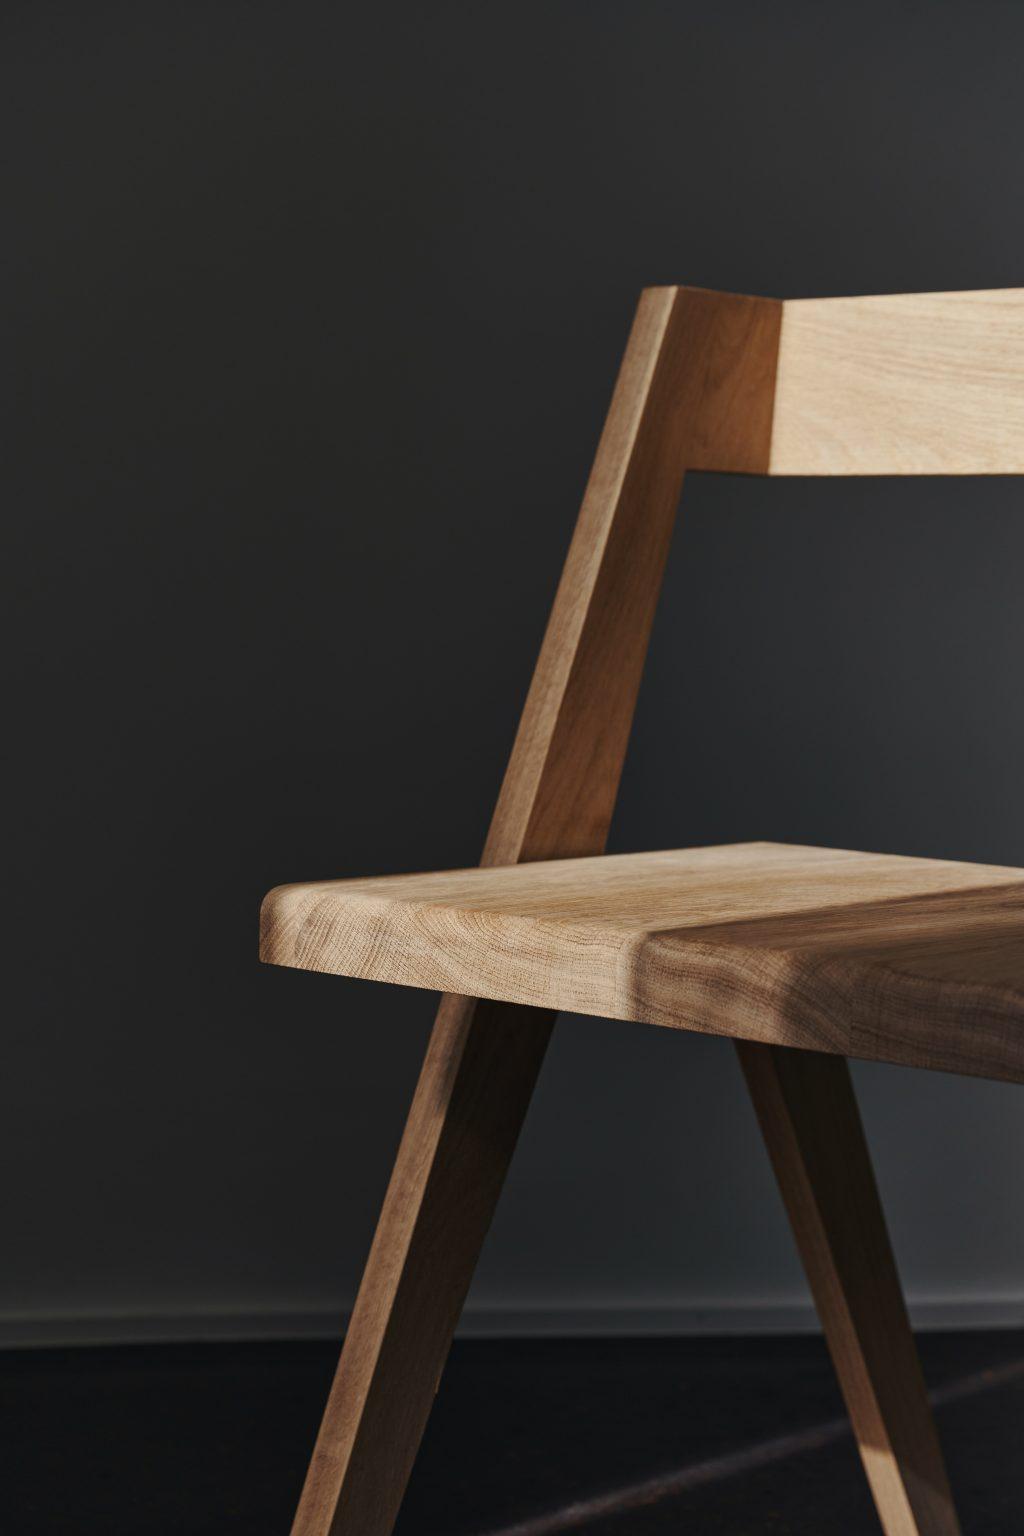 Biennale Interieur - Belgium's leading design and interior event - Ykoon-chair-x-damon-de-backer-2021-bis-03.jpg